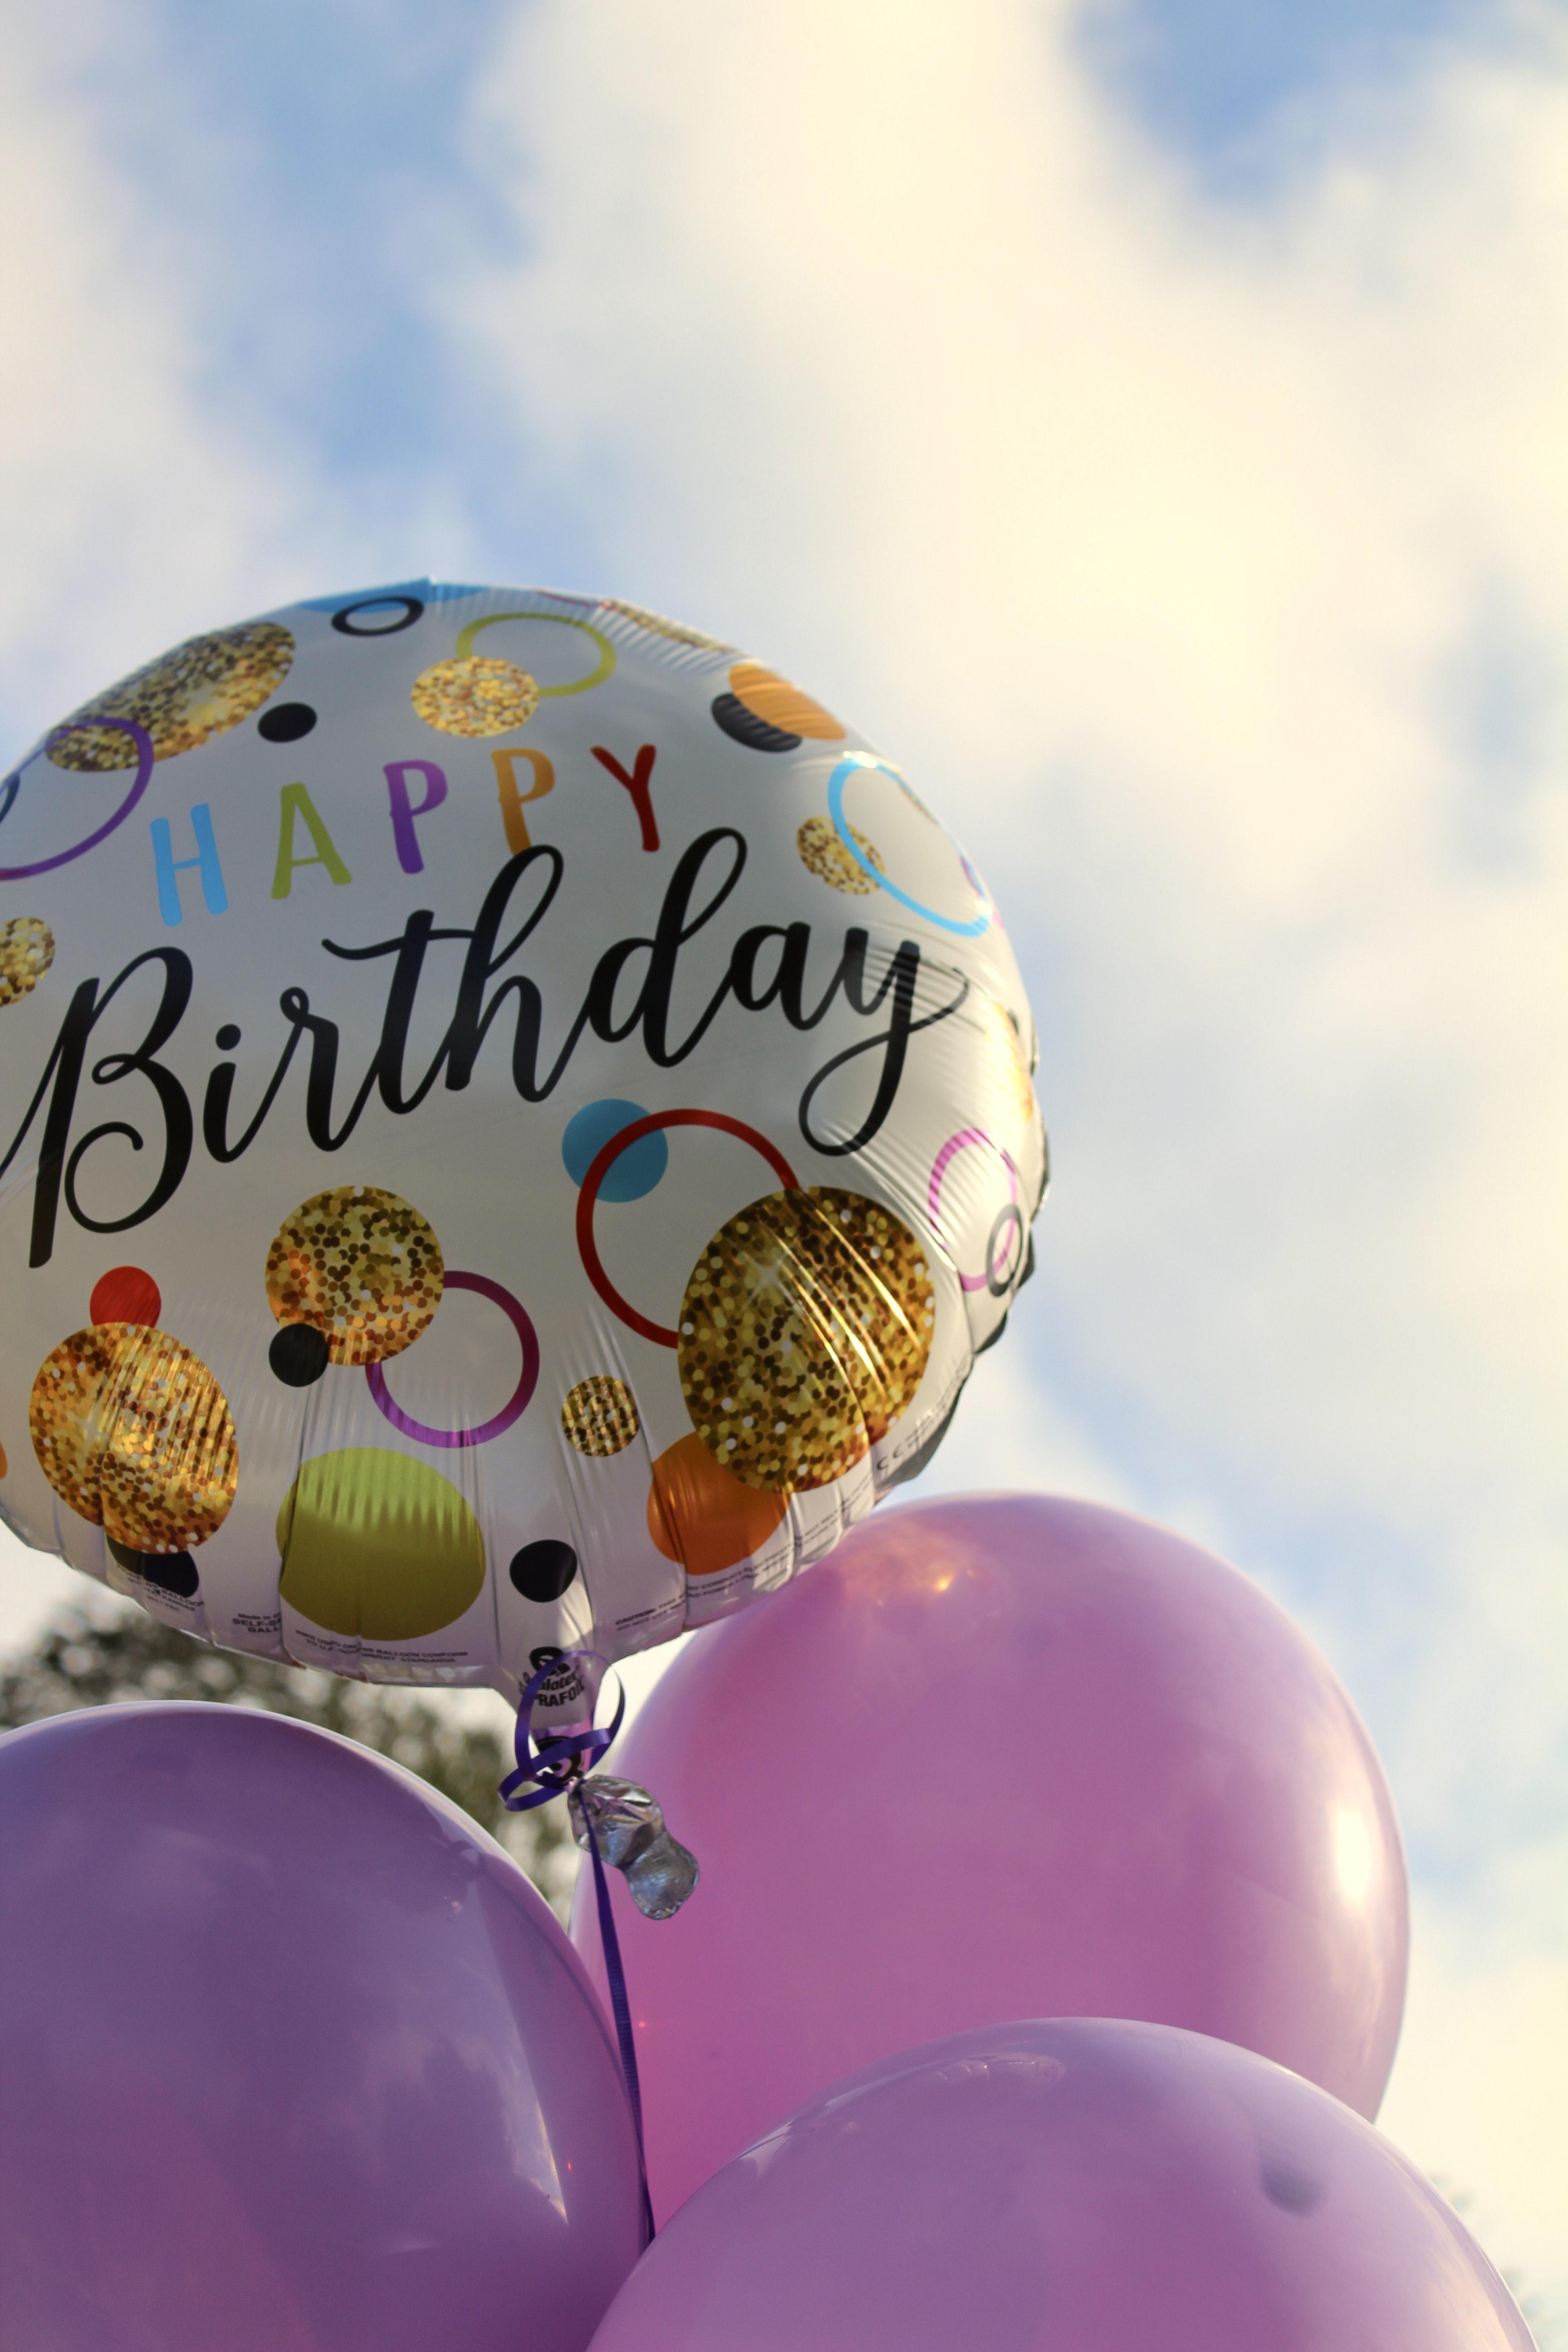 Birthday Wallpapers Free Hd Download 500 Hq Unsplash